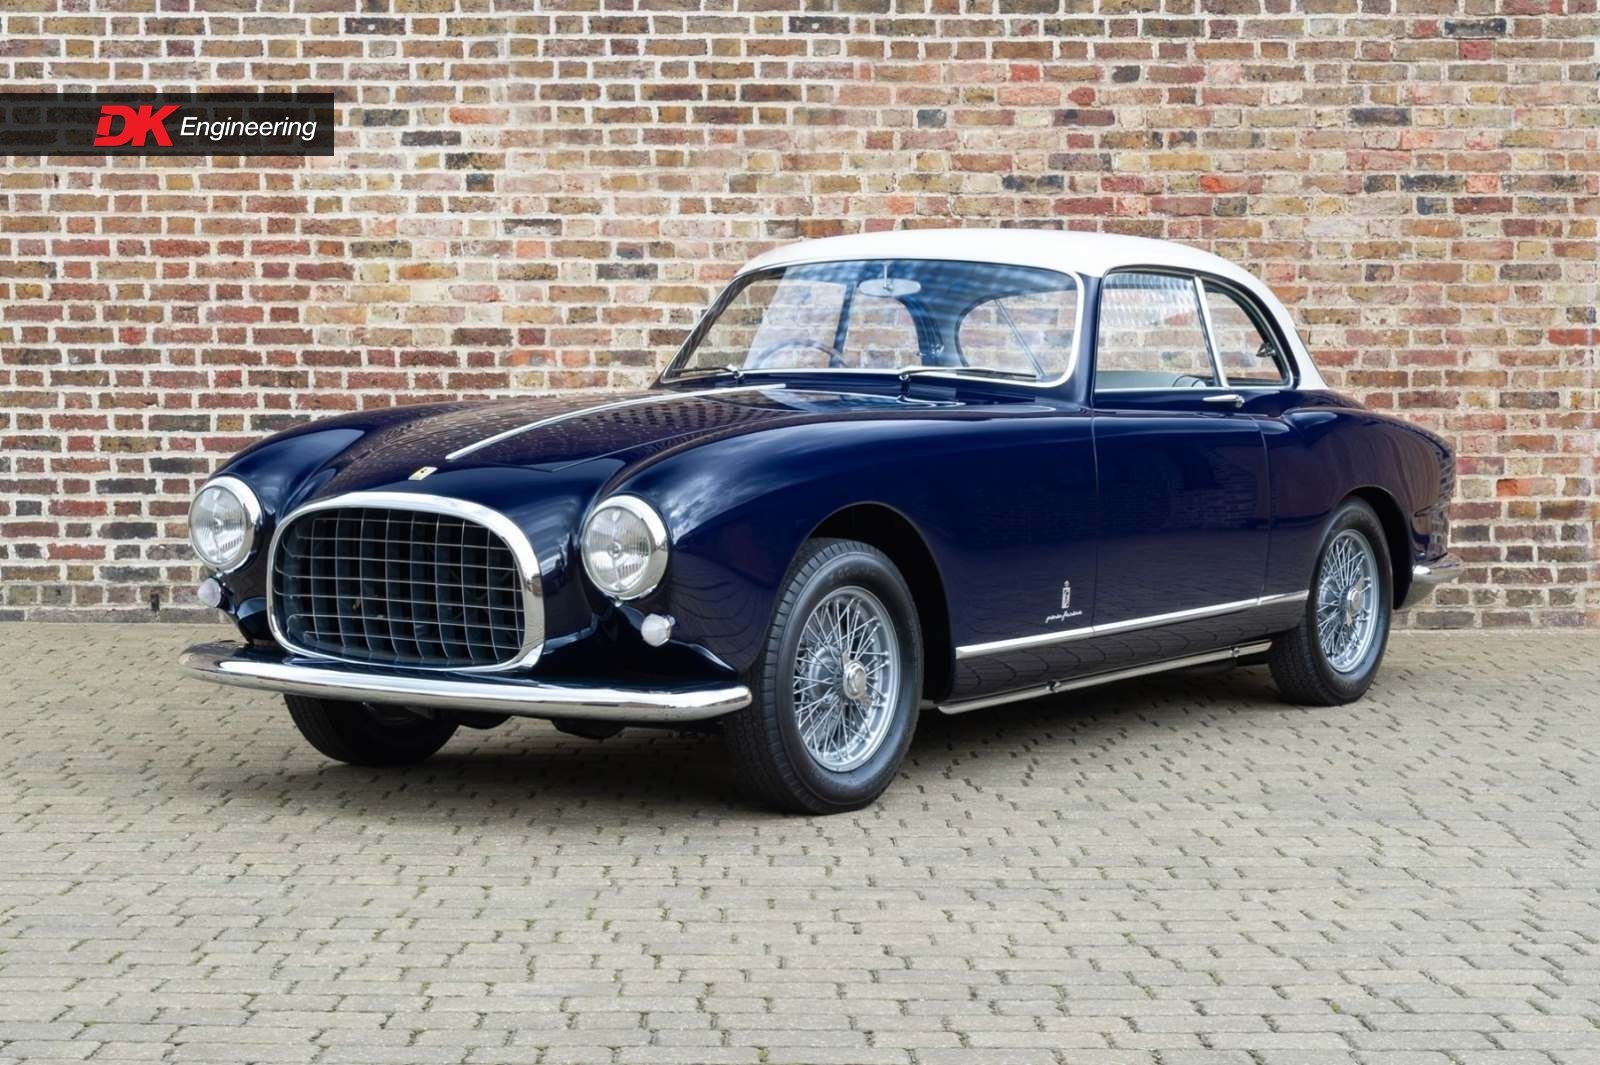 1952 Ferrari 212 The First Berlinetta Ferrari Bodied By Pinin Farina Classic Driver Market